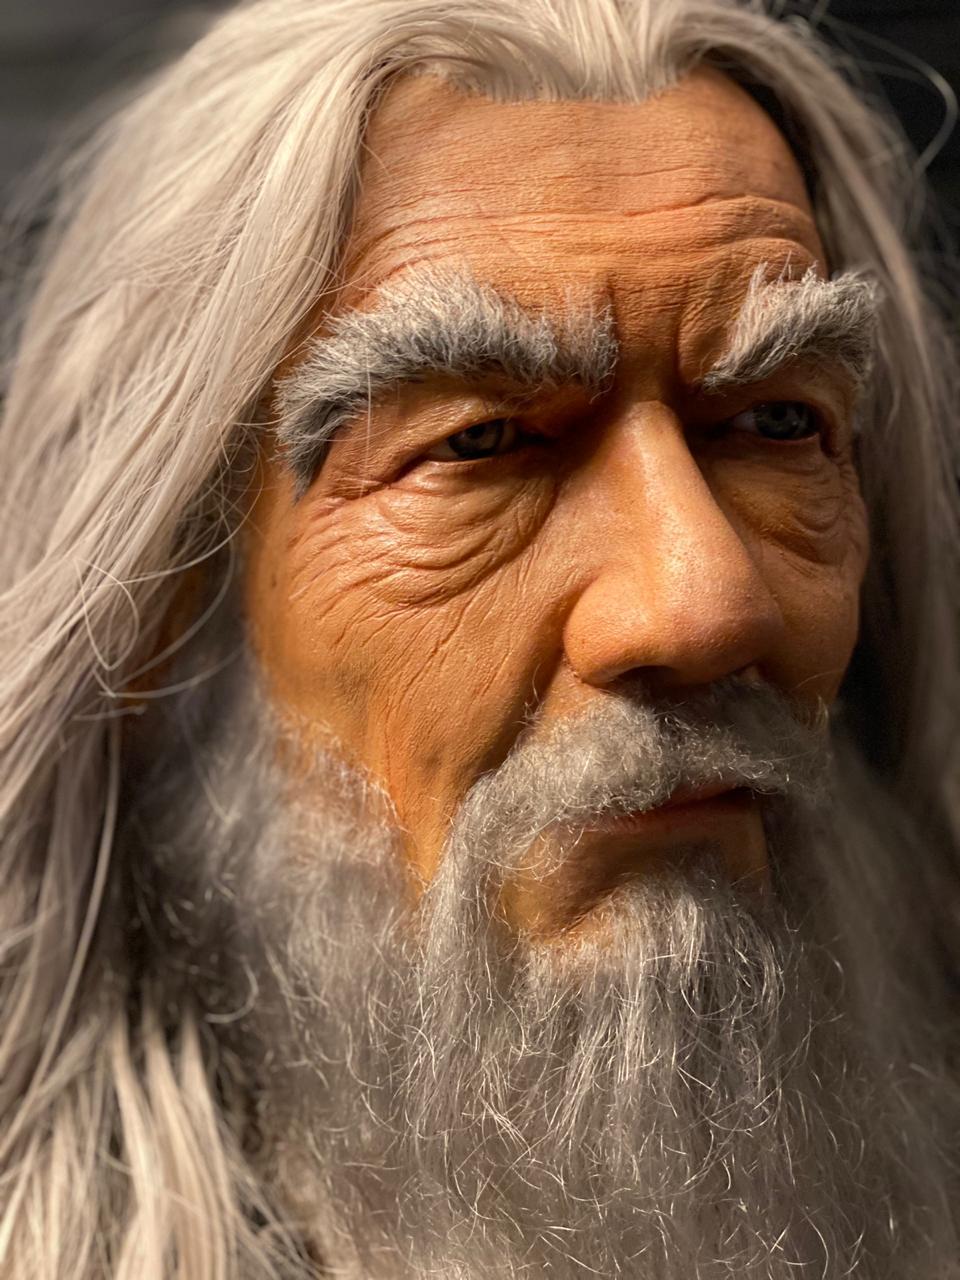 Busto Gandalf Escala 1:1 - By Edinho Maga